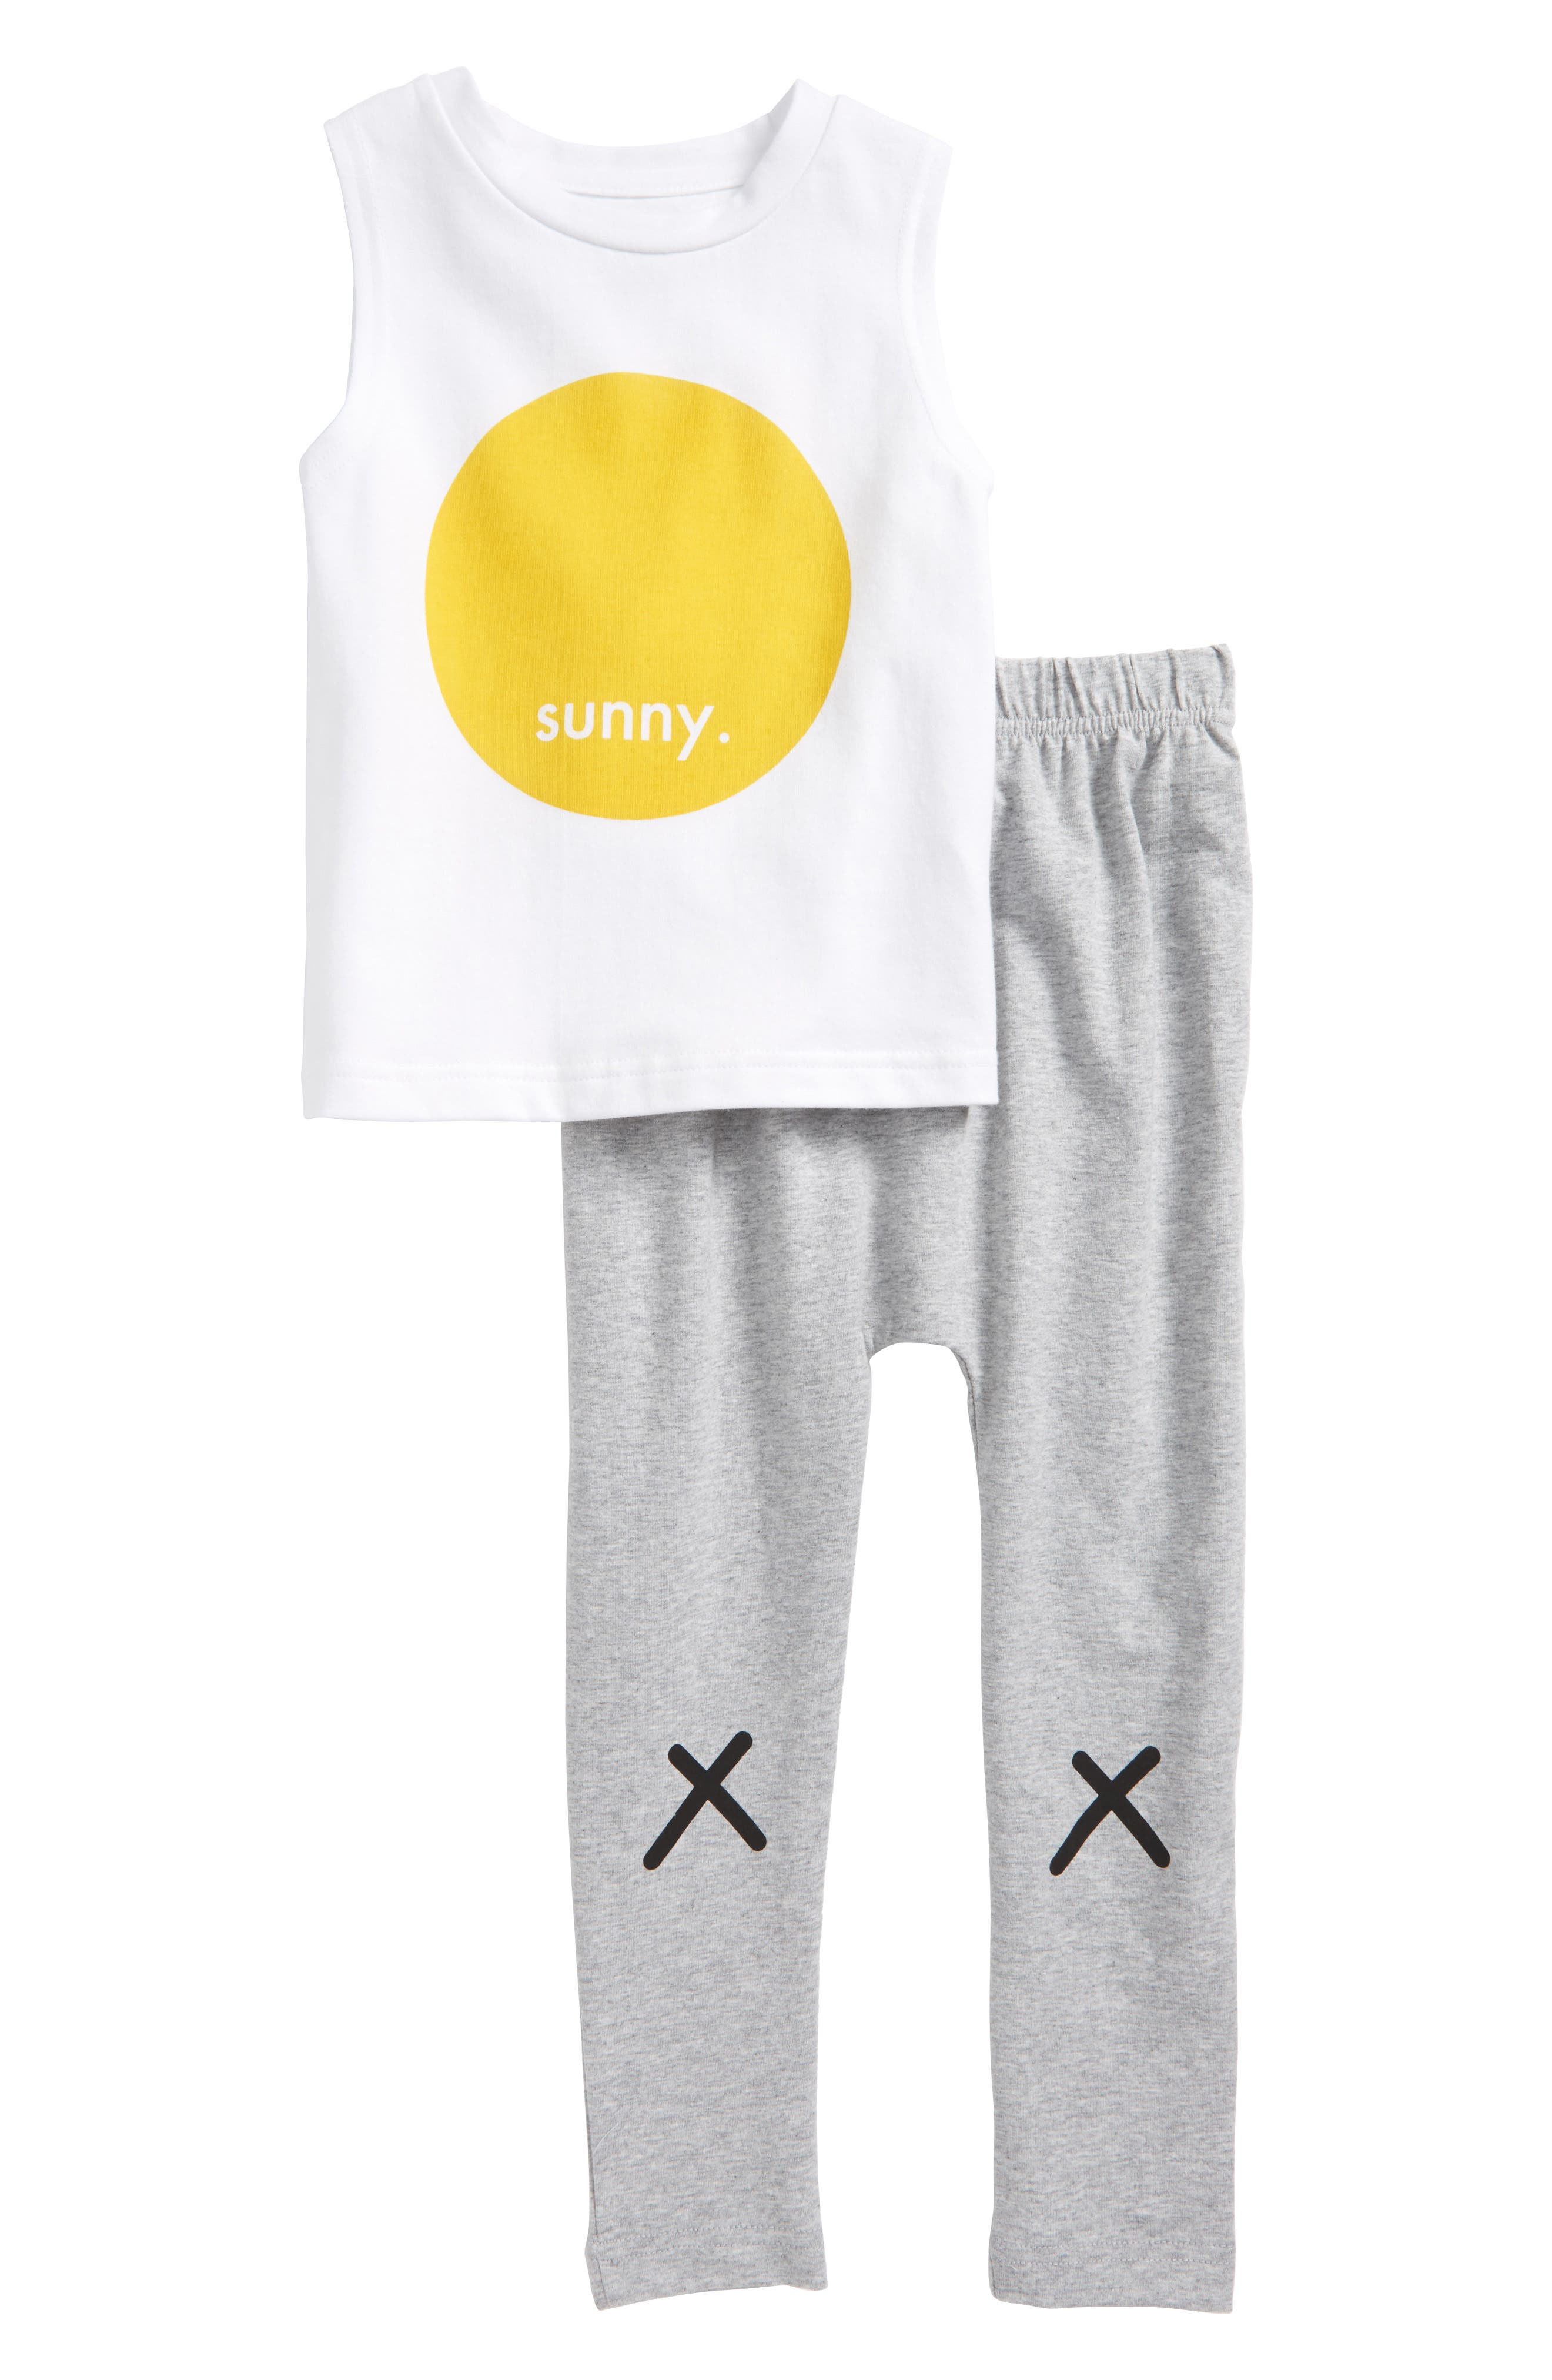 Sunny Tank & Sweatpants Set,                         Main,                         color, 109